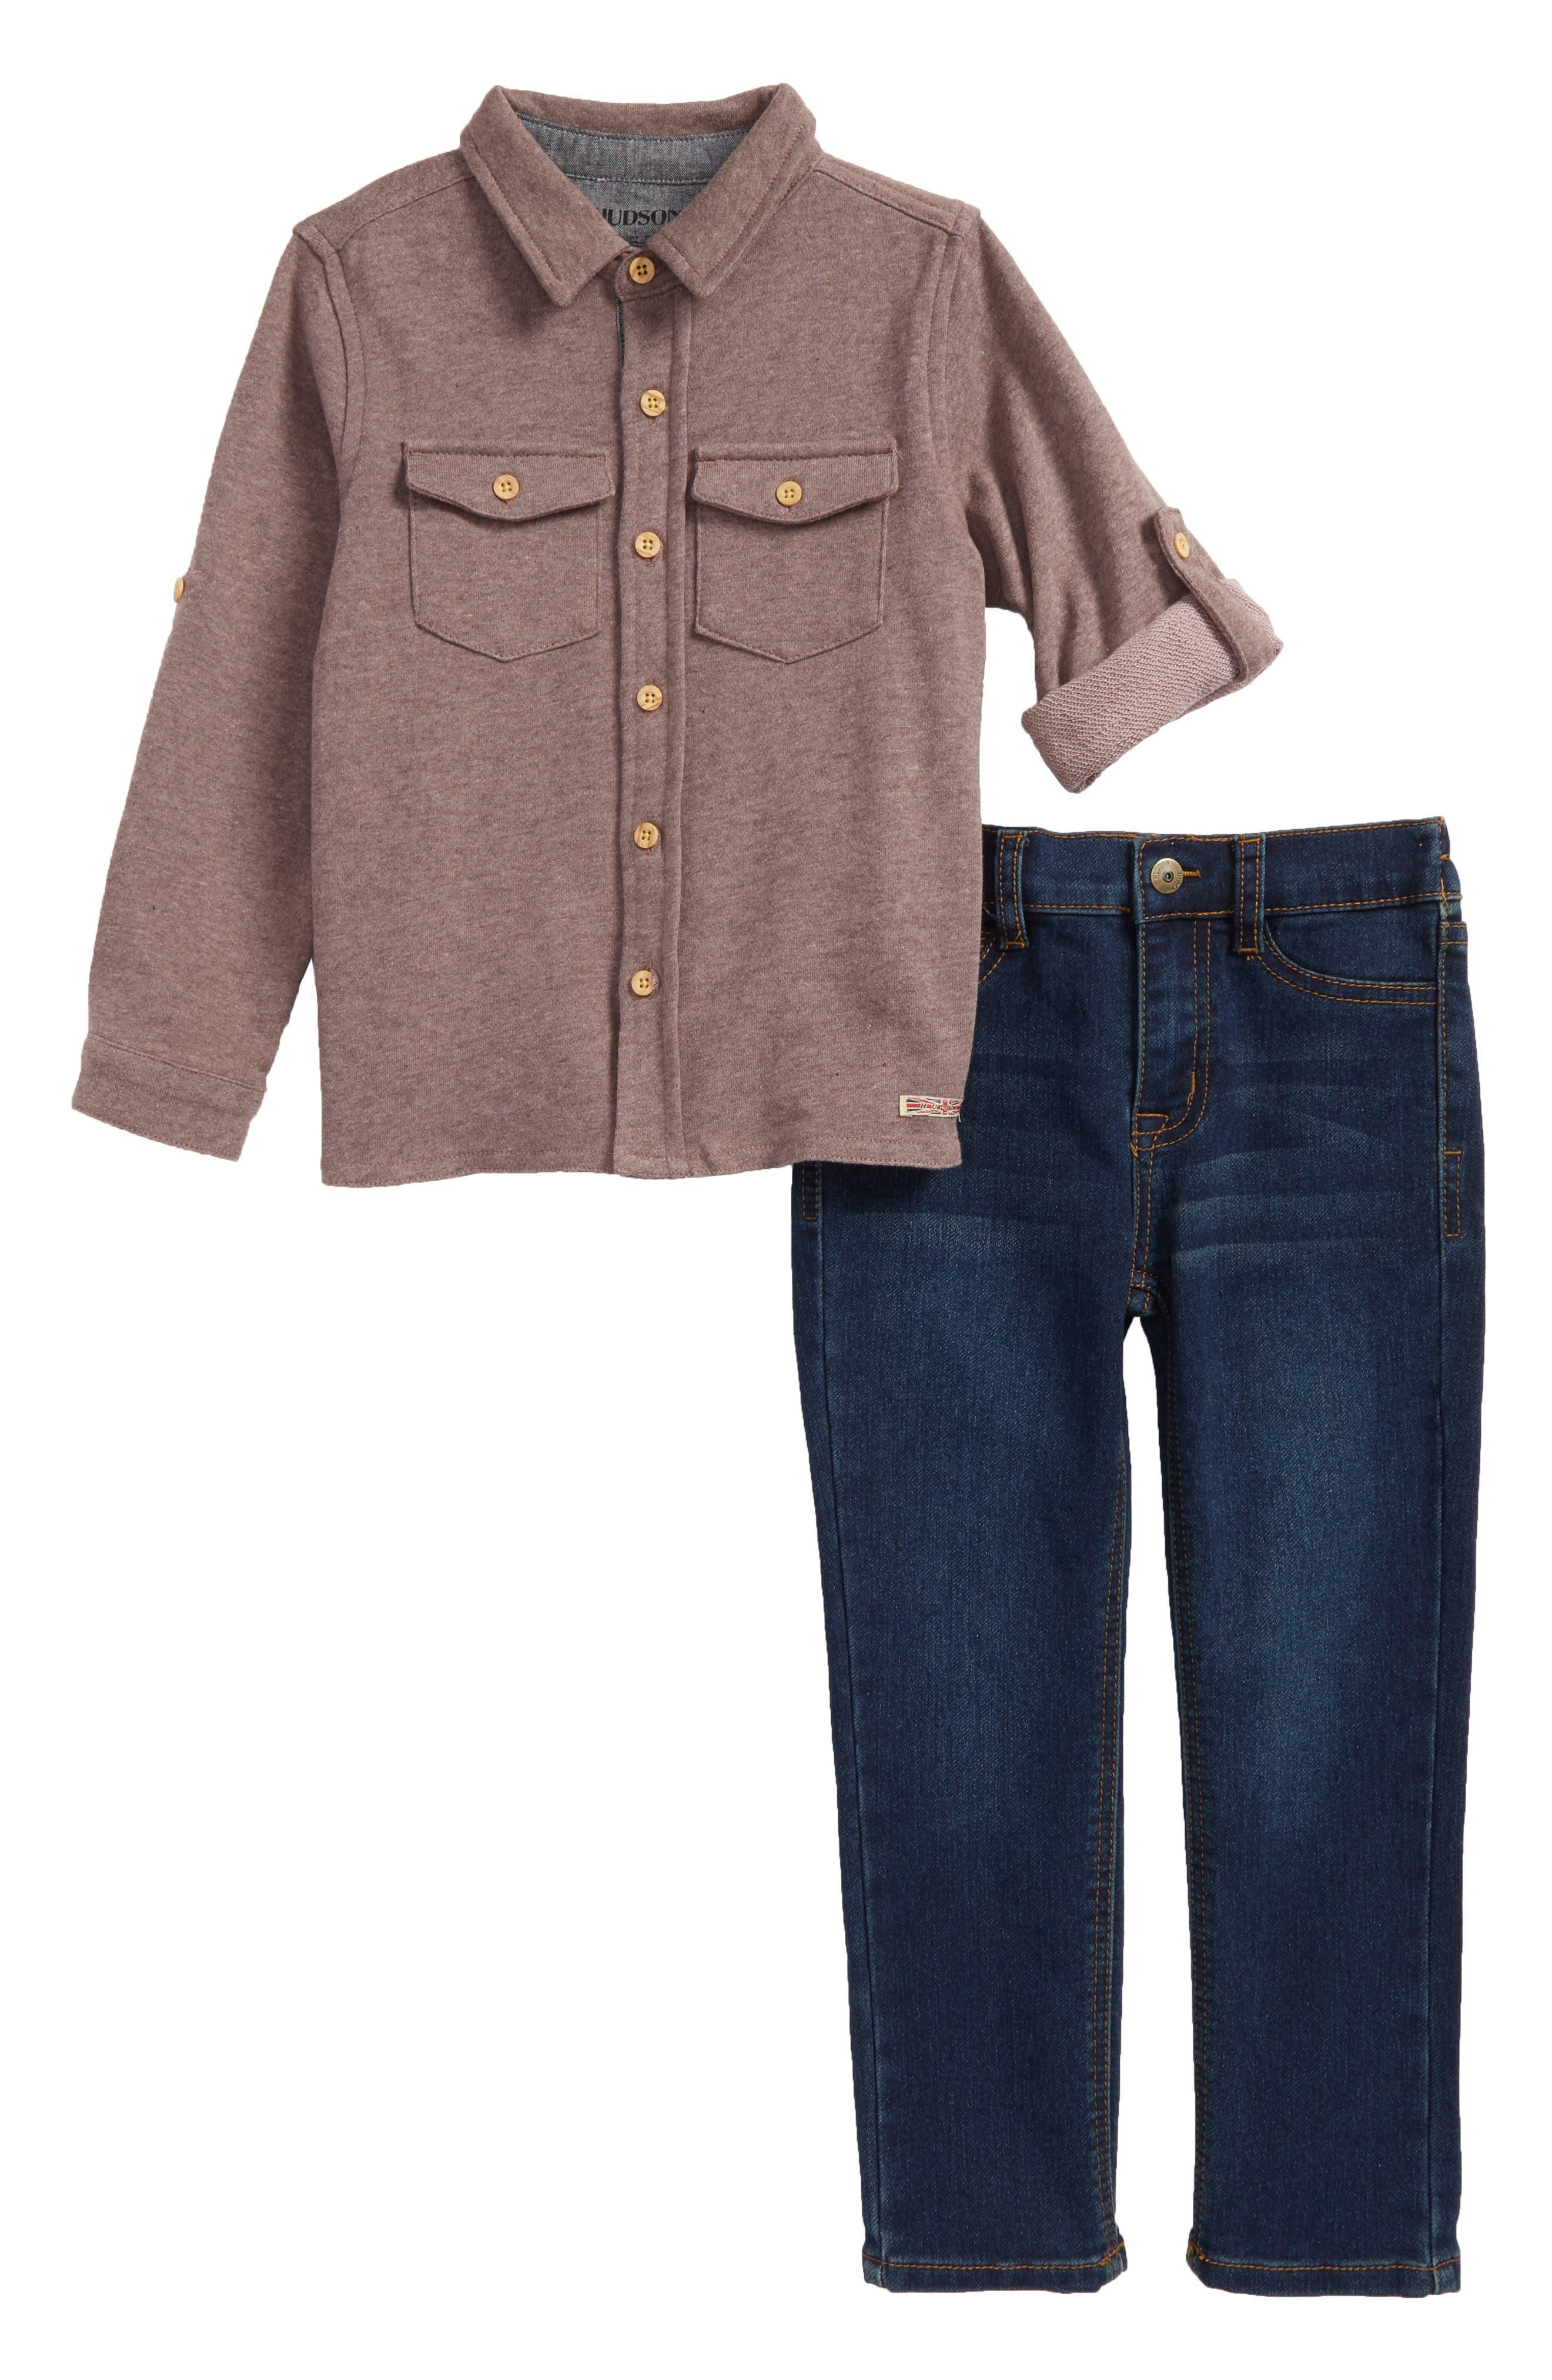 Main Image - Hudson Kids French Terry Shirt & Jeans Set (Toddler Boys)